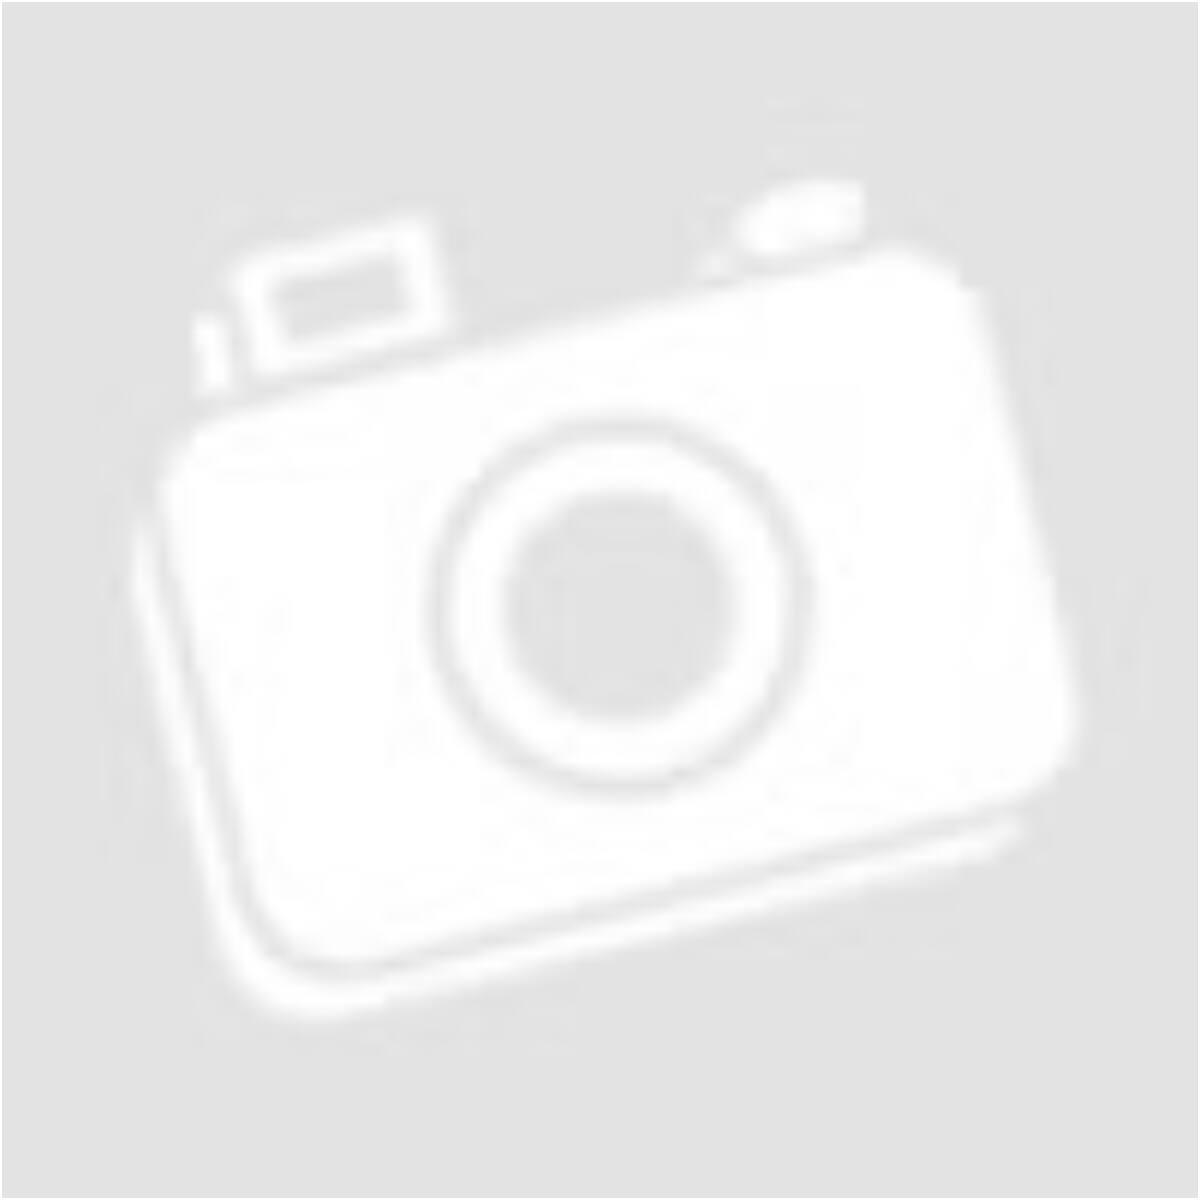 Topolino sötétkék virágos dzseki (80) 28db62f4cd